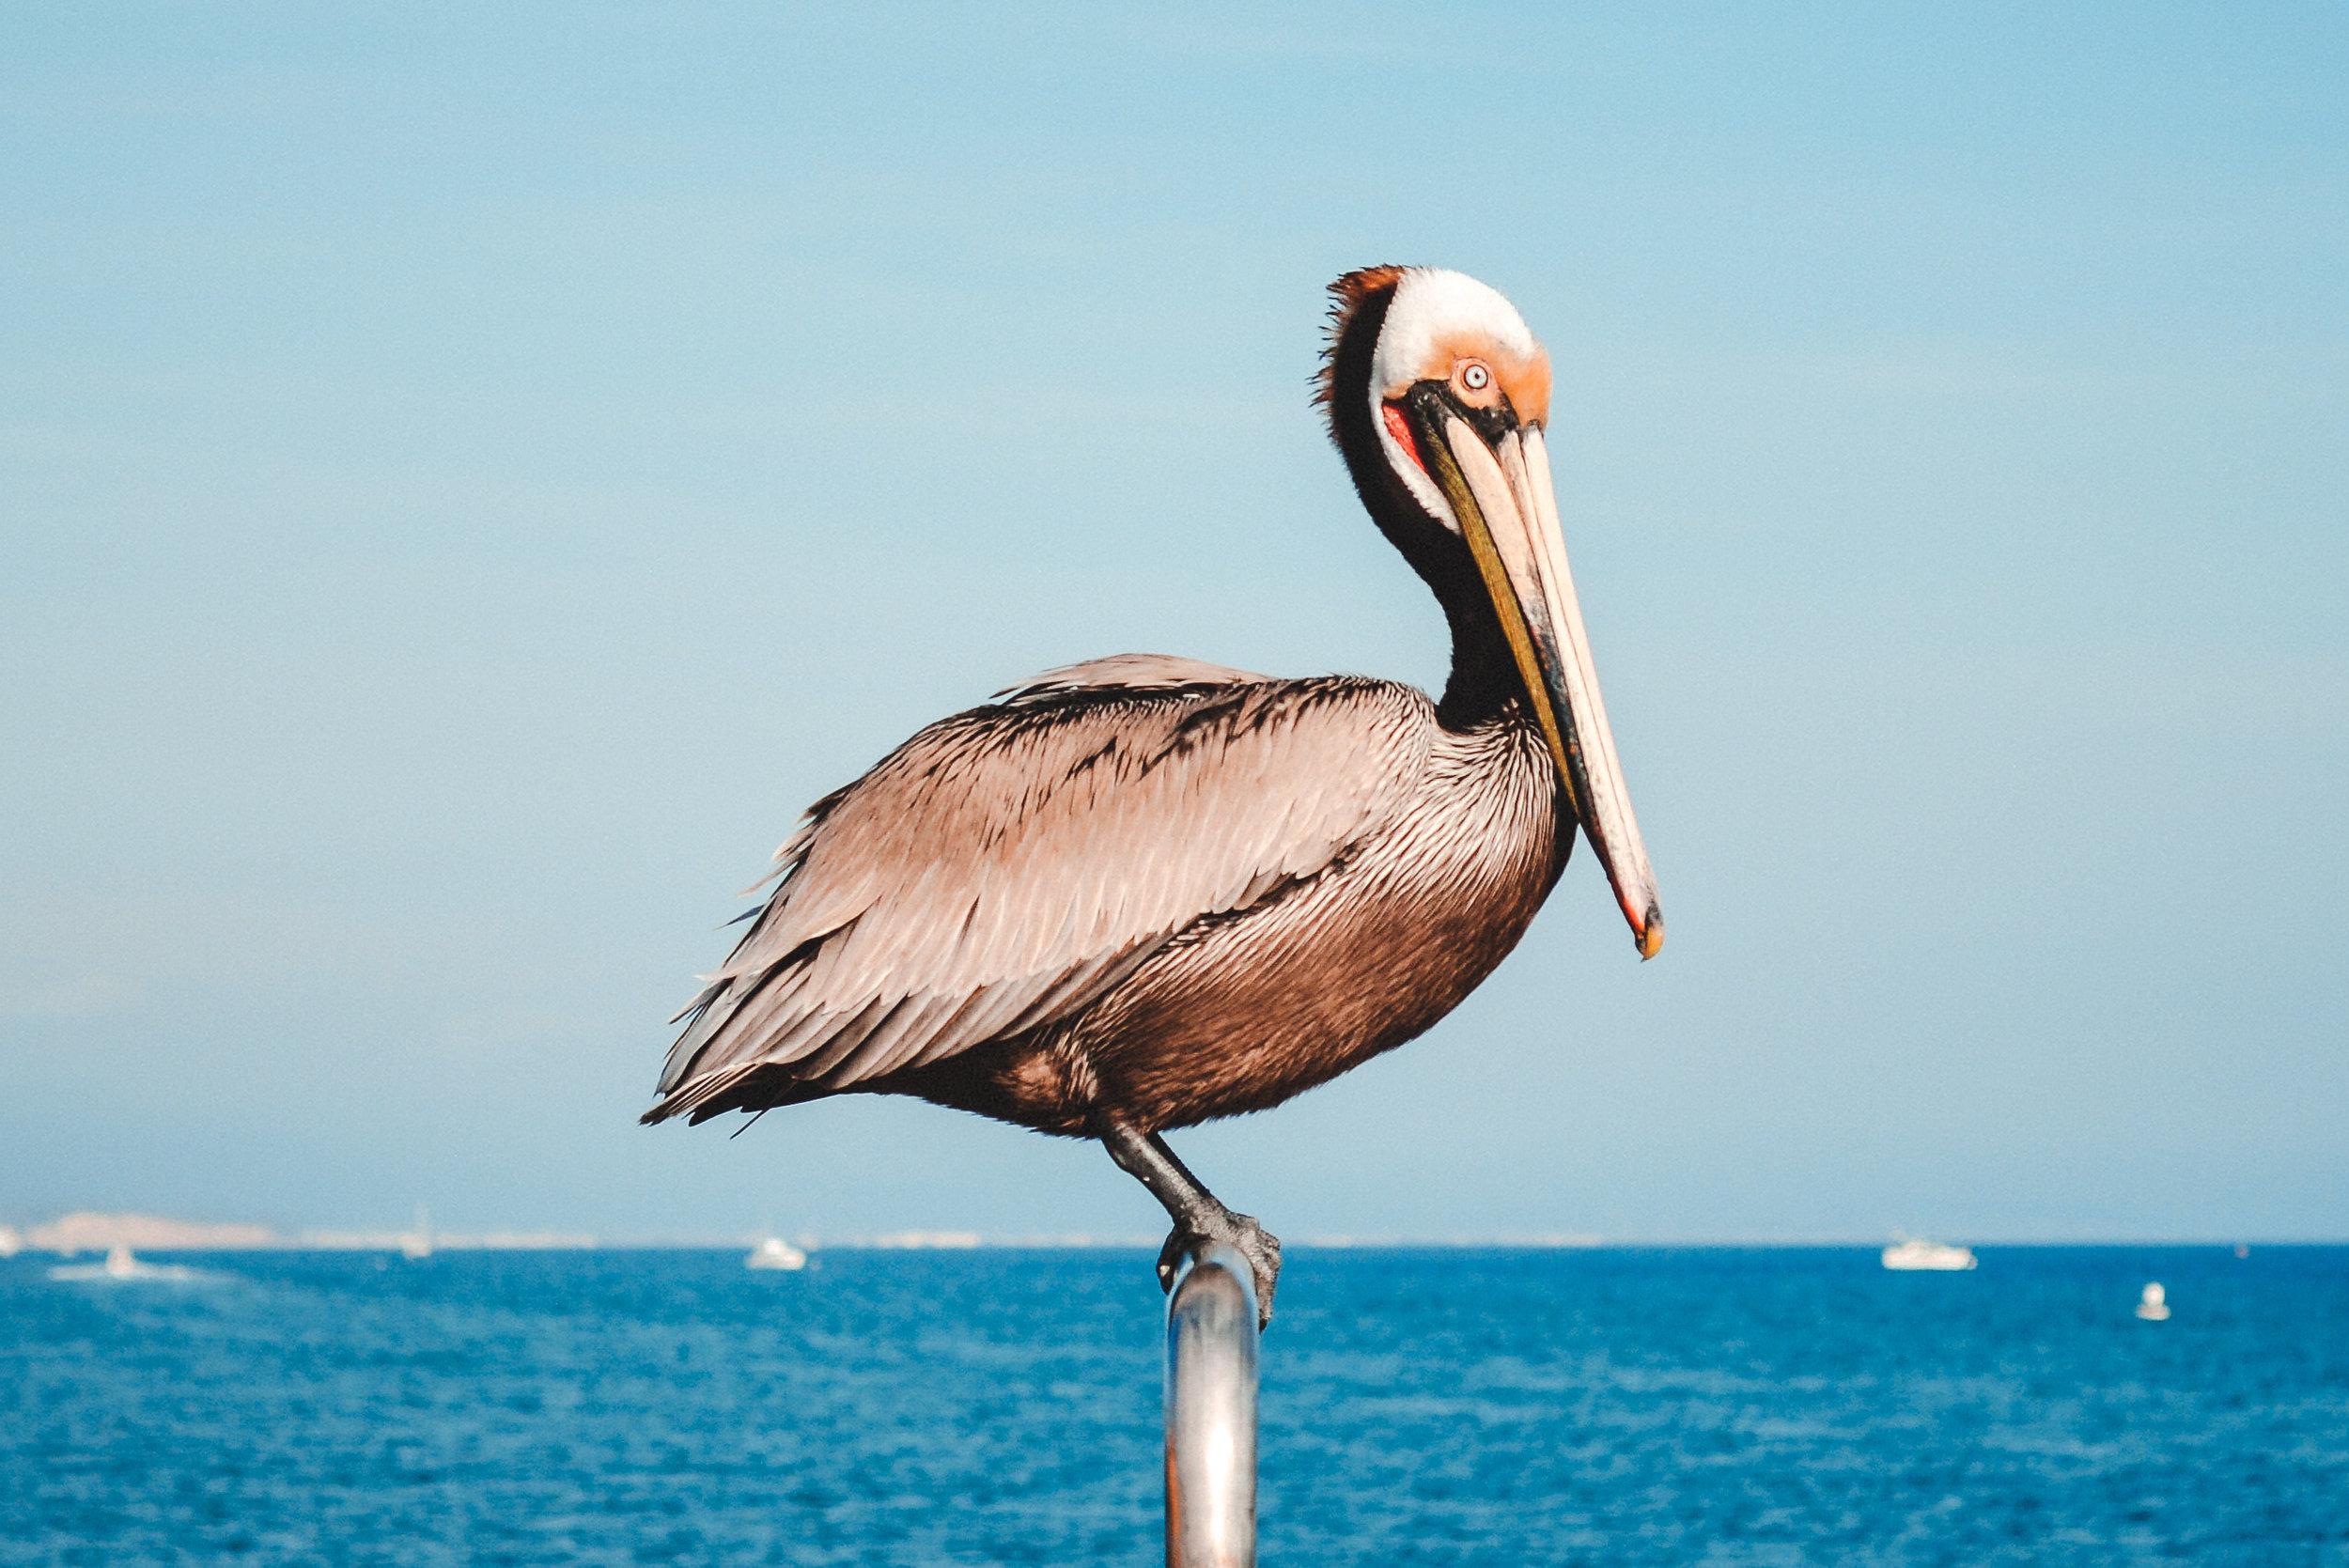 ryan thompson creative photography - pelican 1